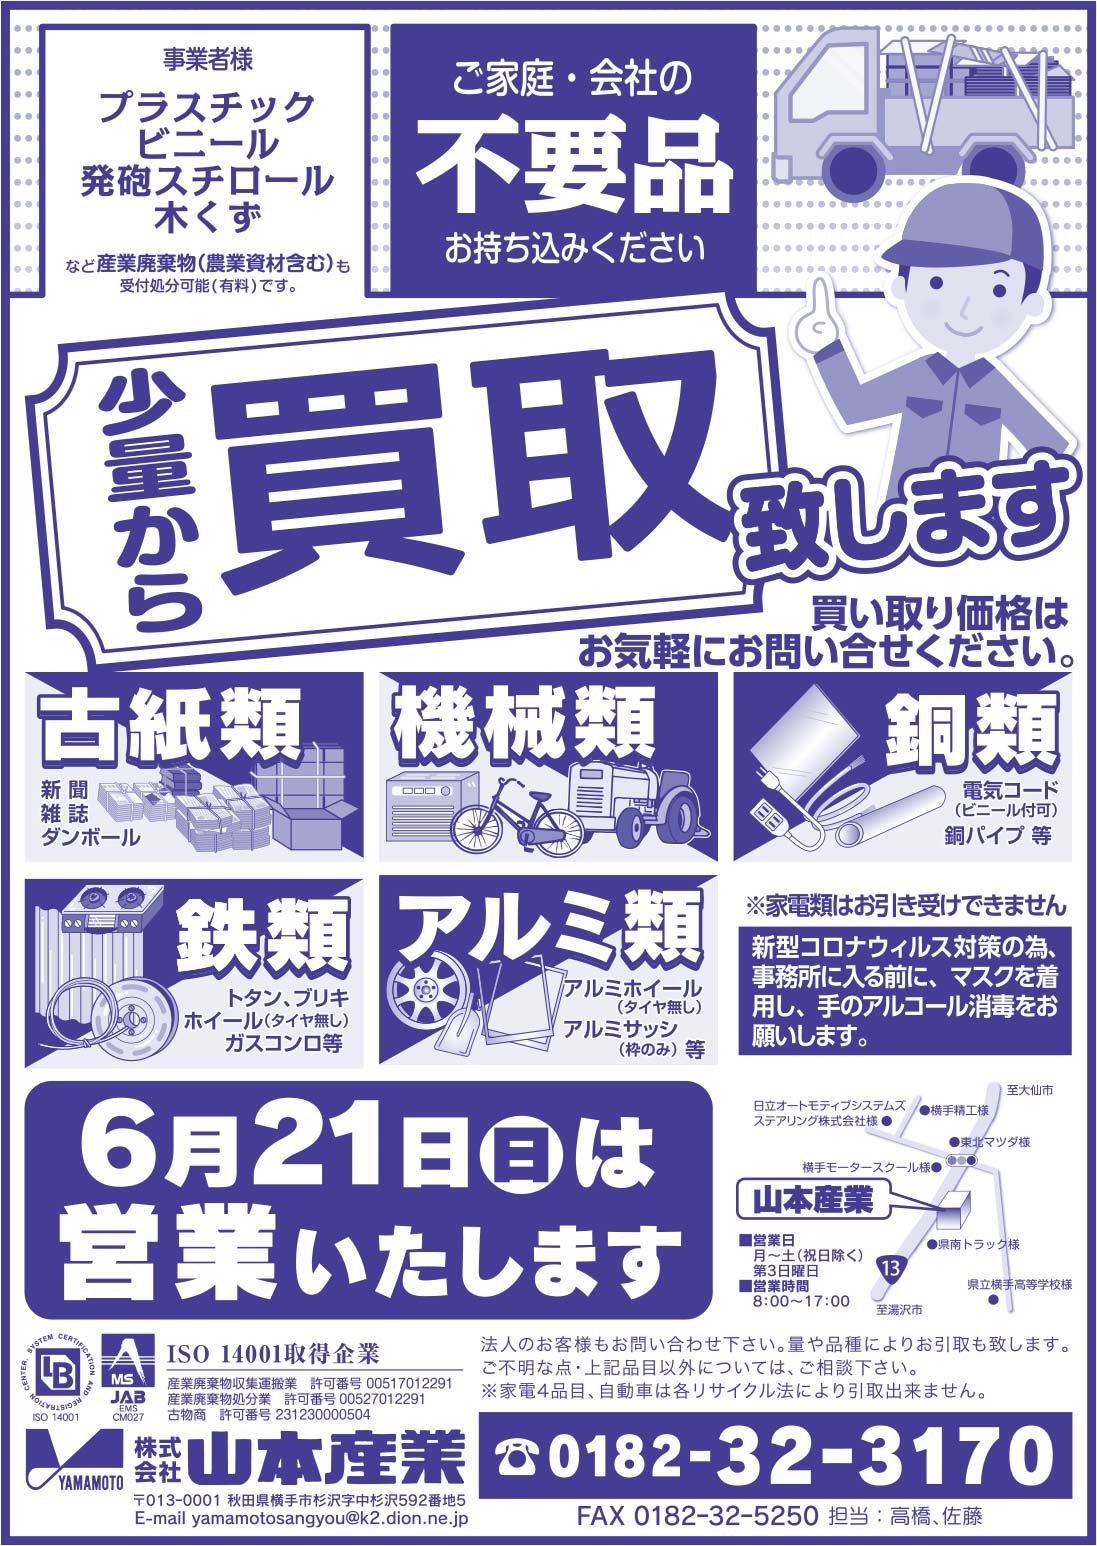 株式会社 山本産業様の2020.06.19広告